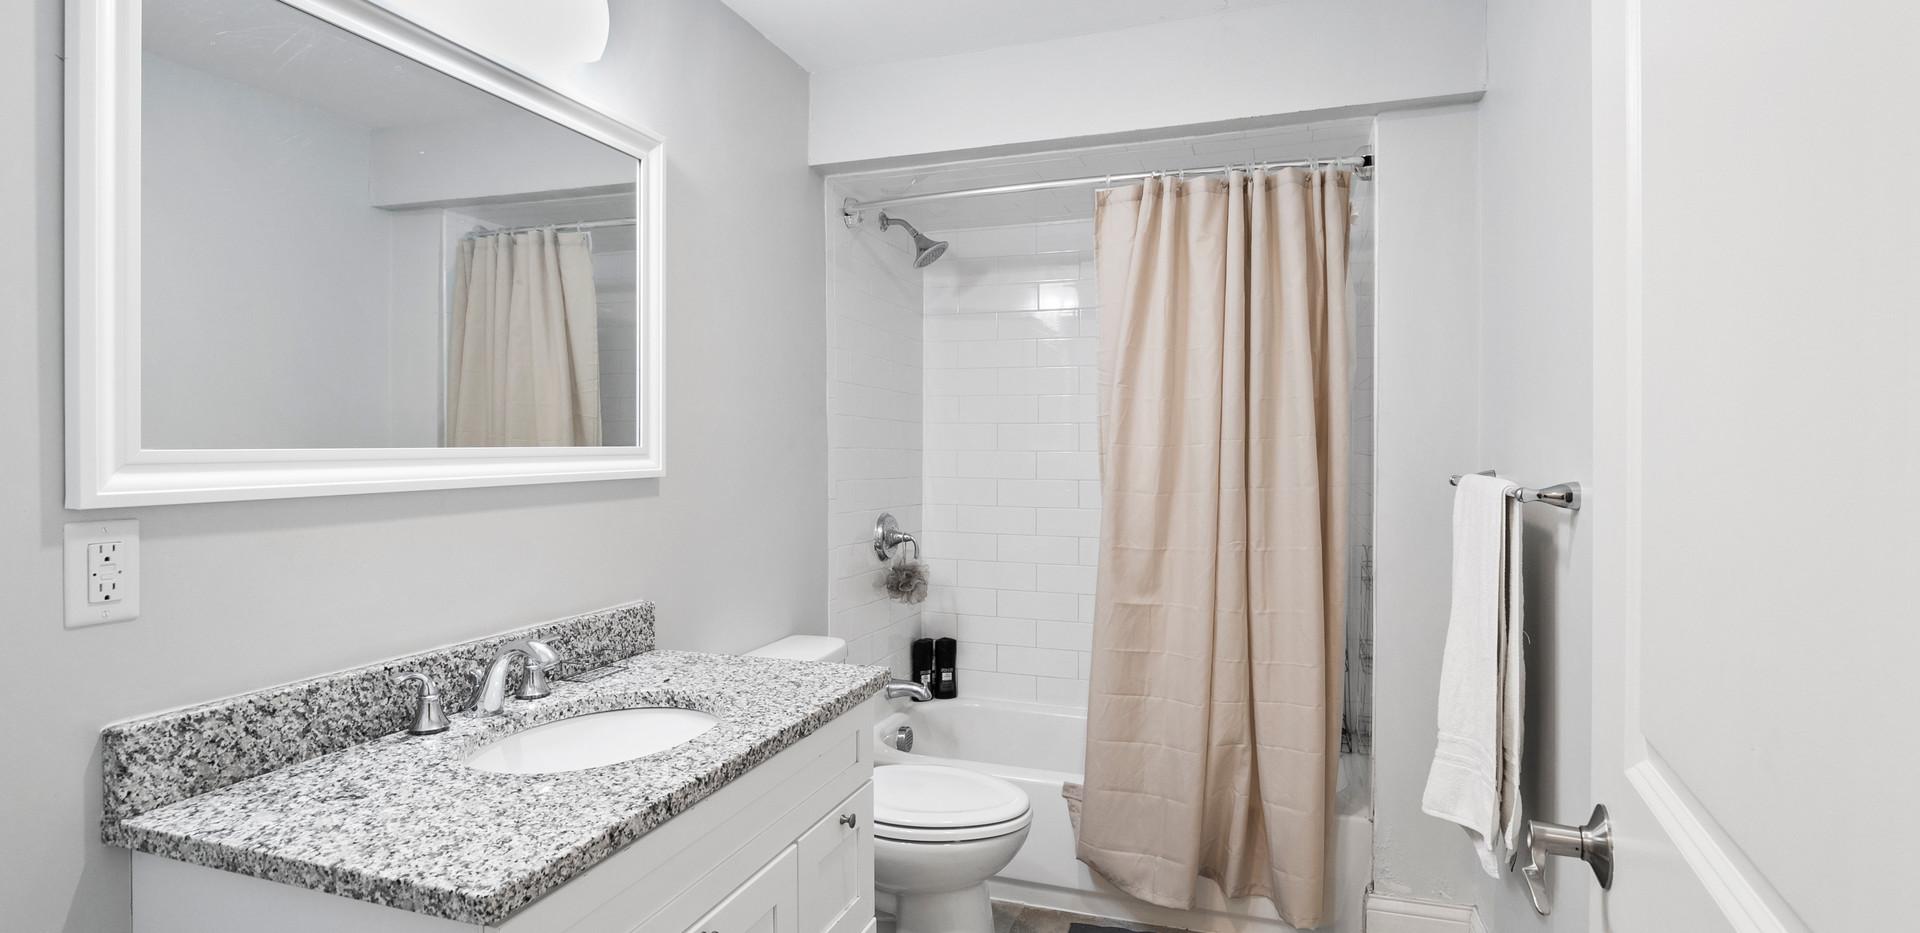 139_Adams_bathroom3.jpg